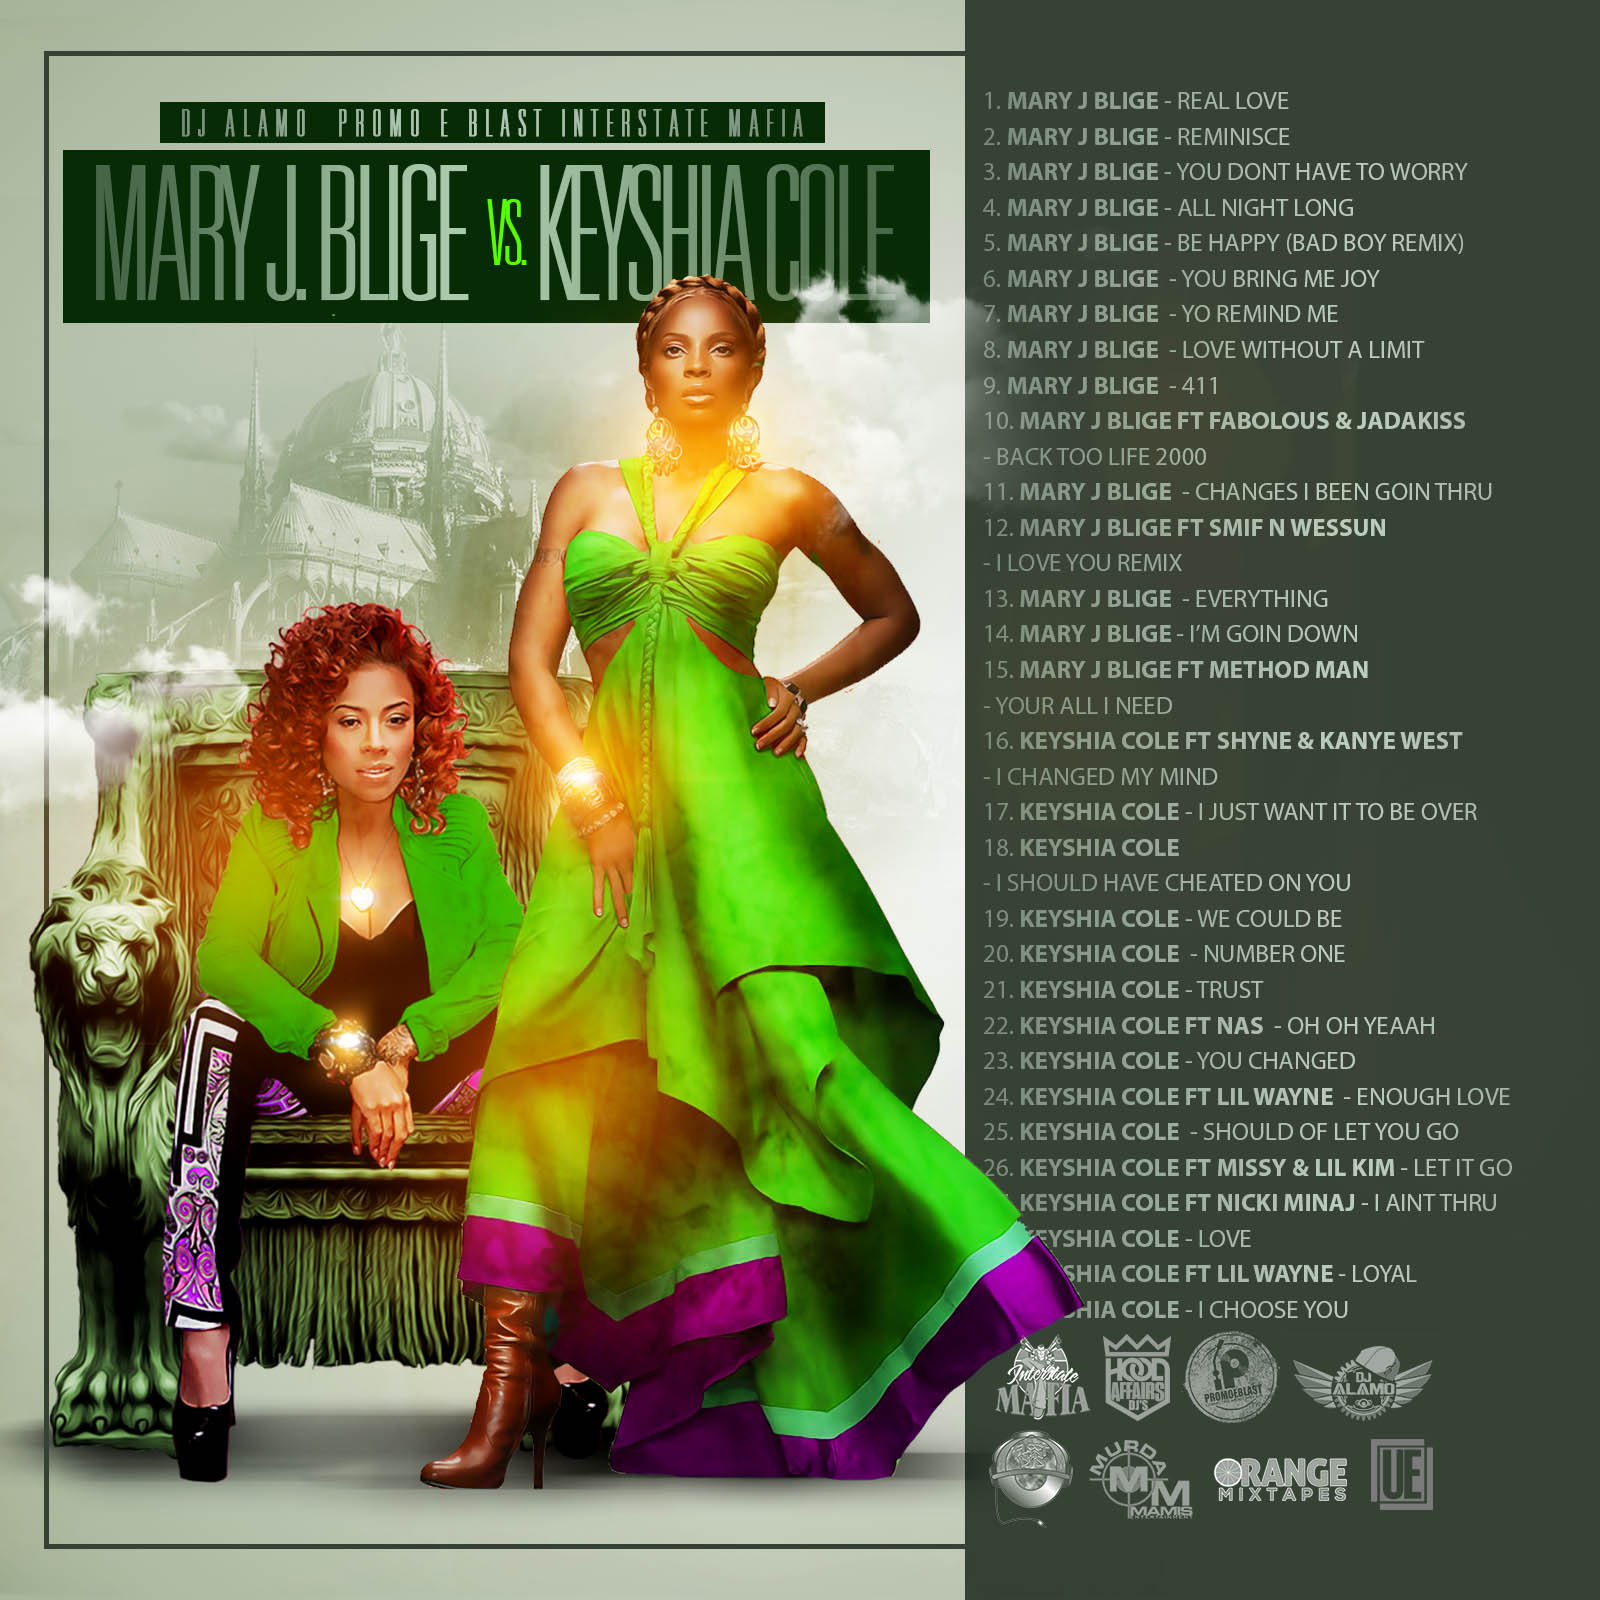 Stream And Download Mixtapes Mary J Blige Vs Kieshia Cole